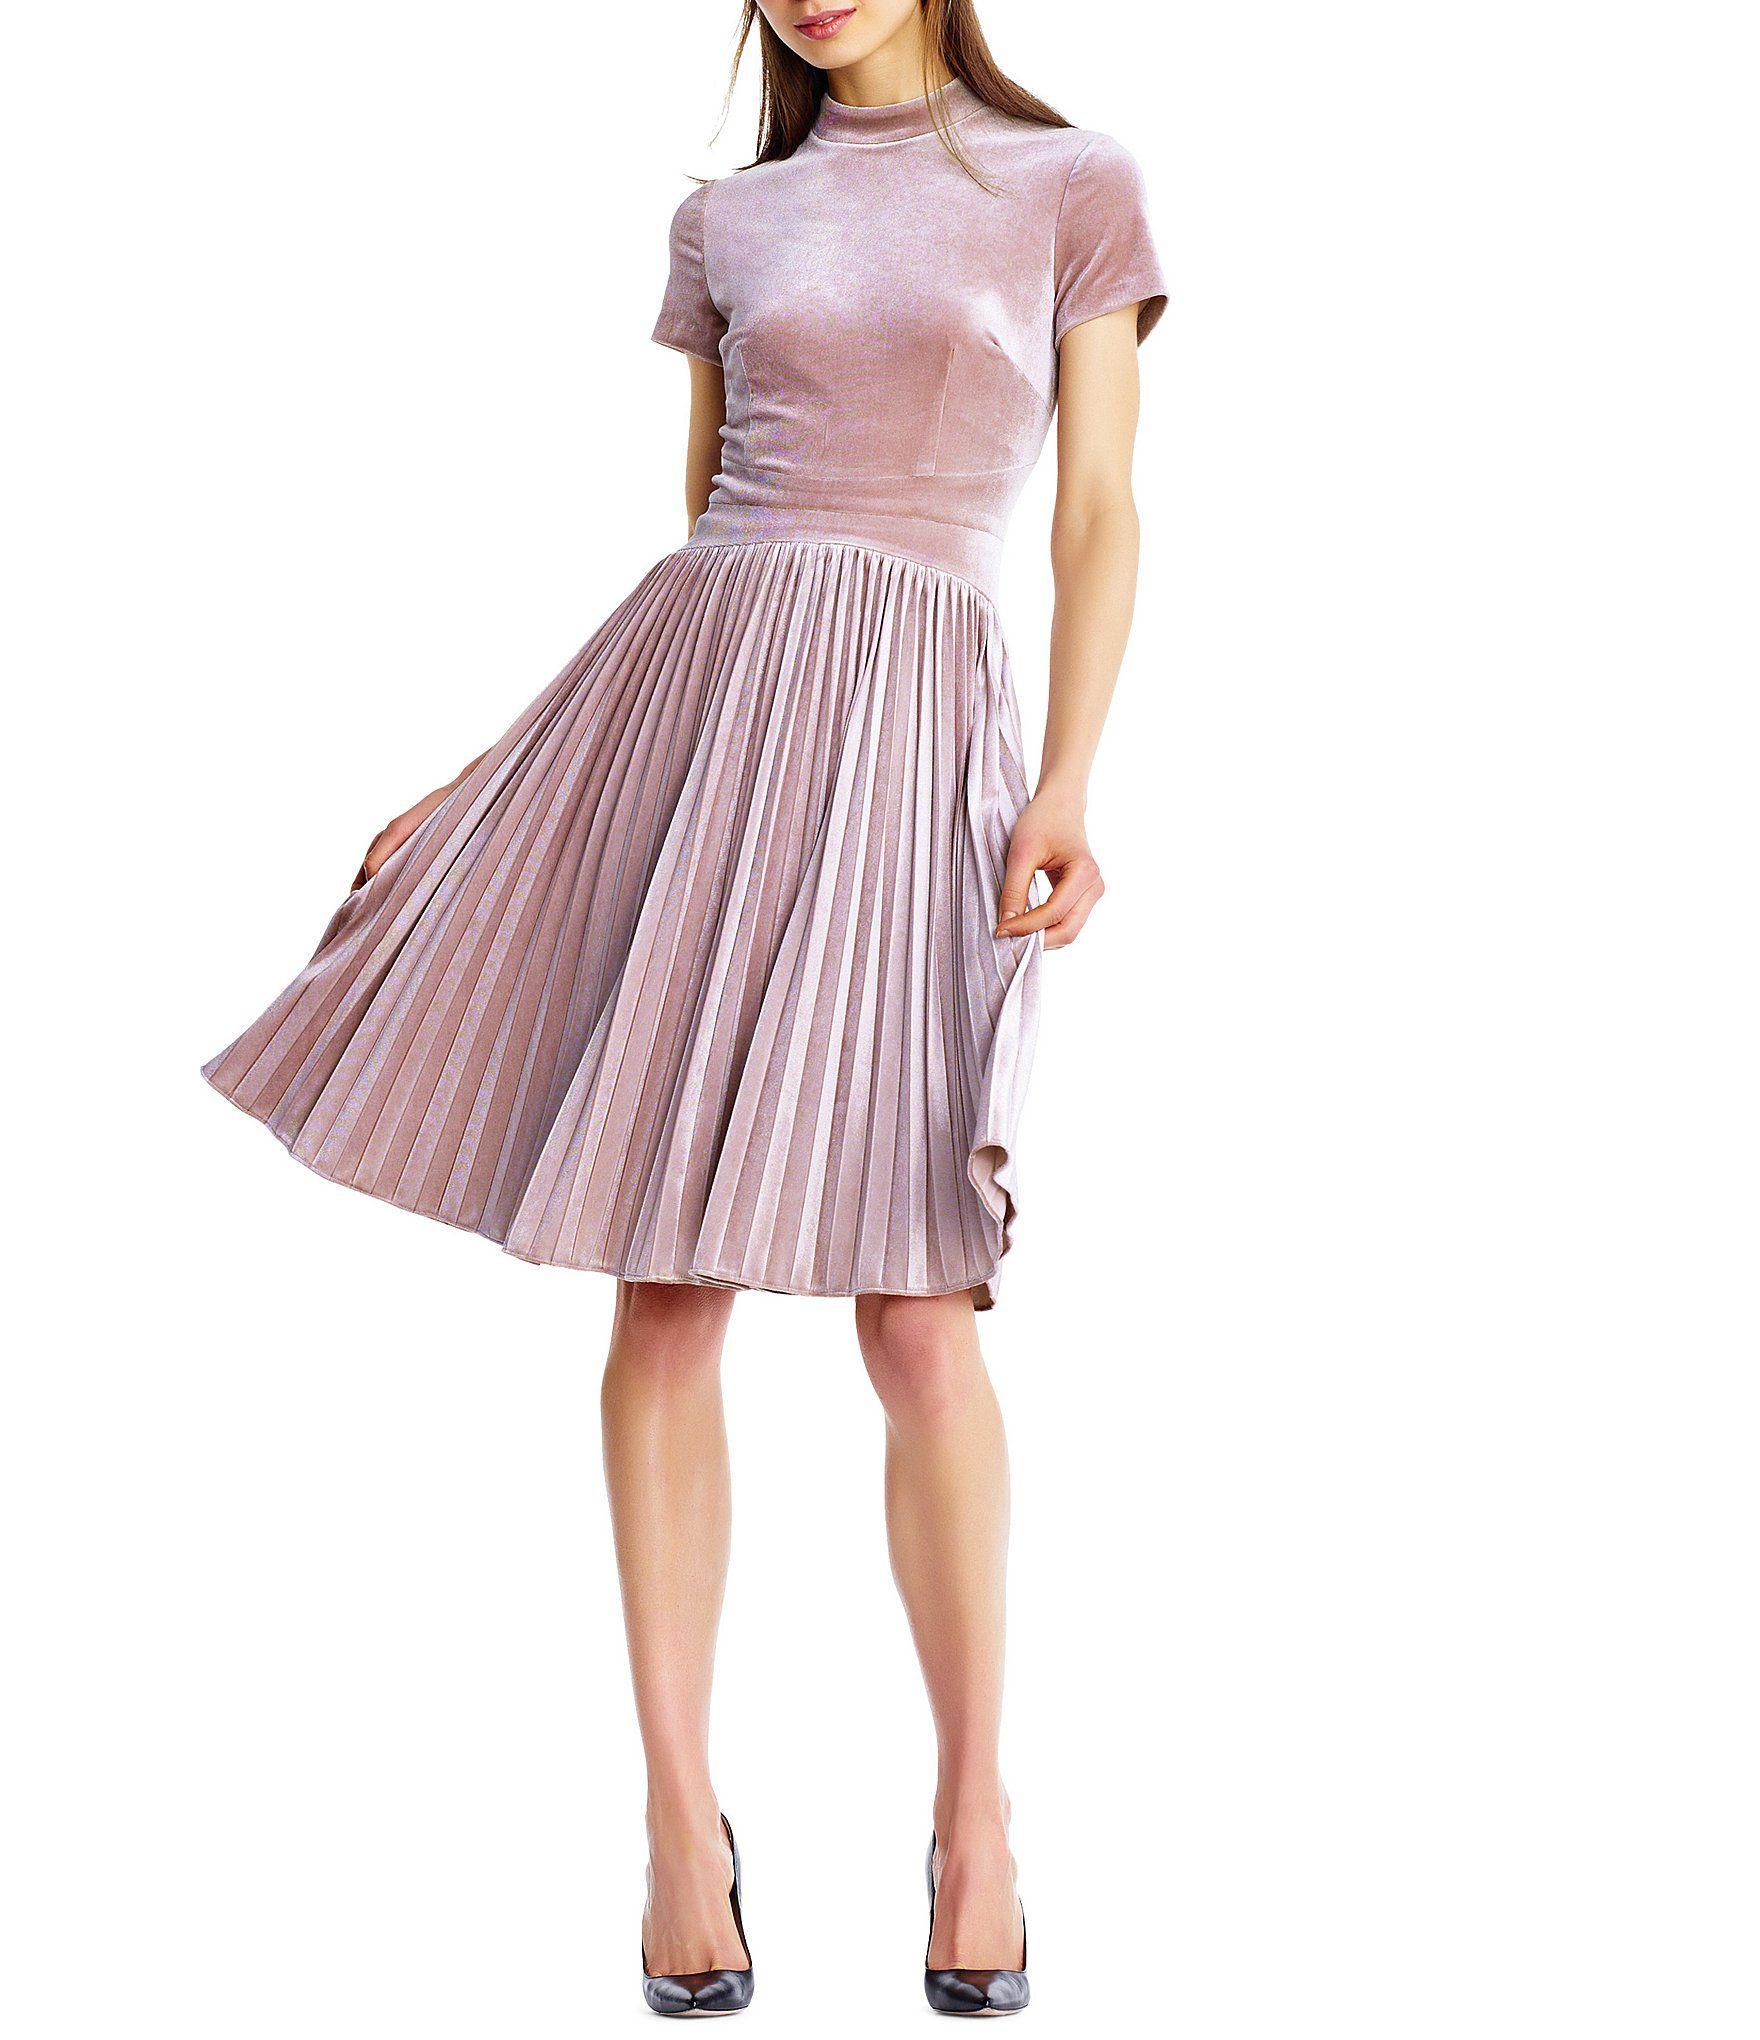 900a70bed83e Shop for Aidan Aidan Mattox Velvet Accordion Pleated Skirt Mockneck A-Line  Dress at Dillards.com. Visit Dillards.com to find clothing